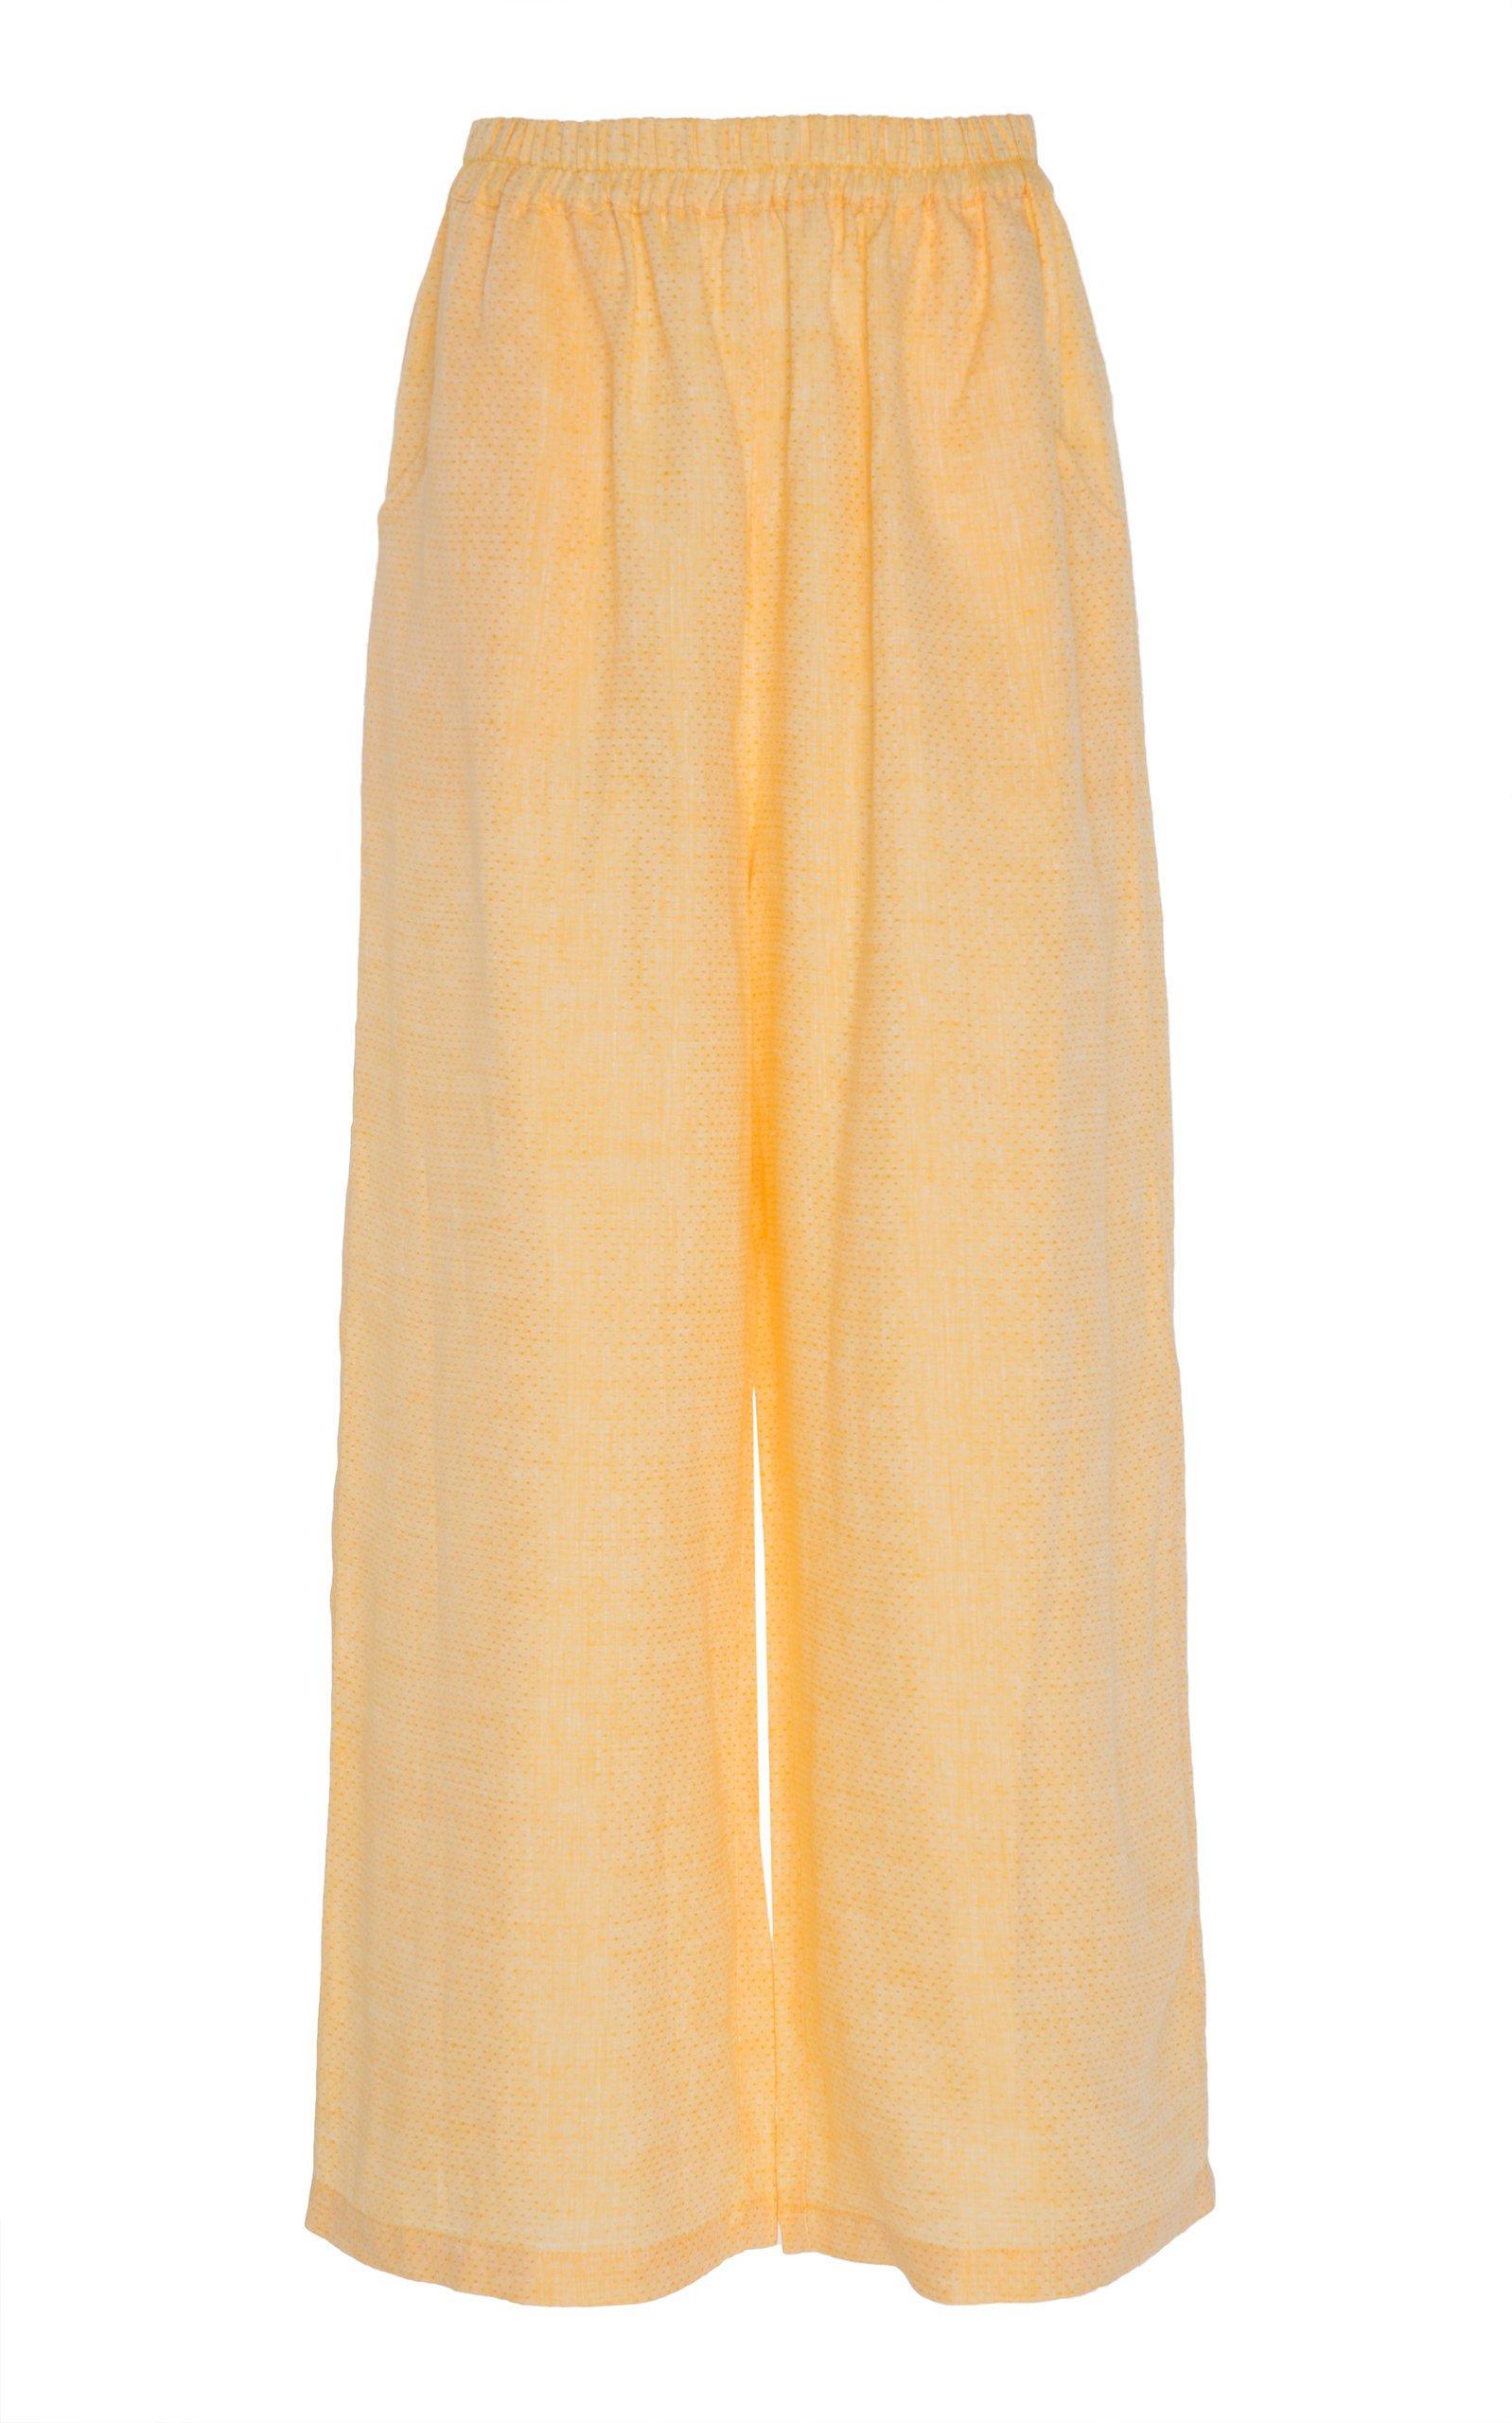 Gül Hürgel Cropped Linen Wide-Leg Pants Size: M